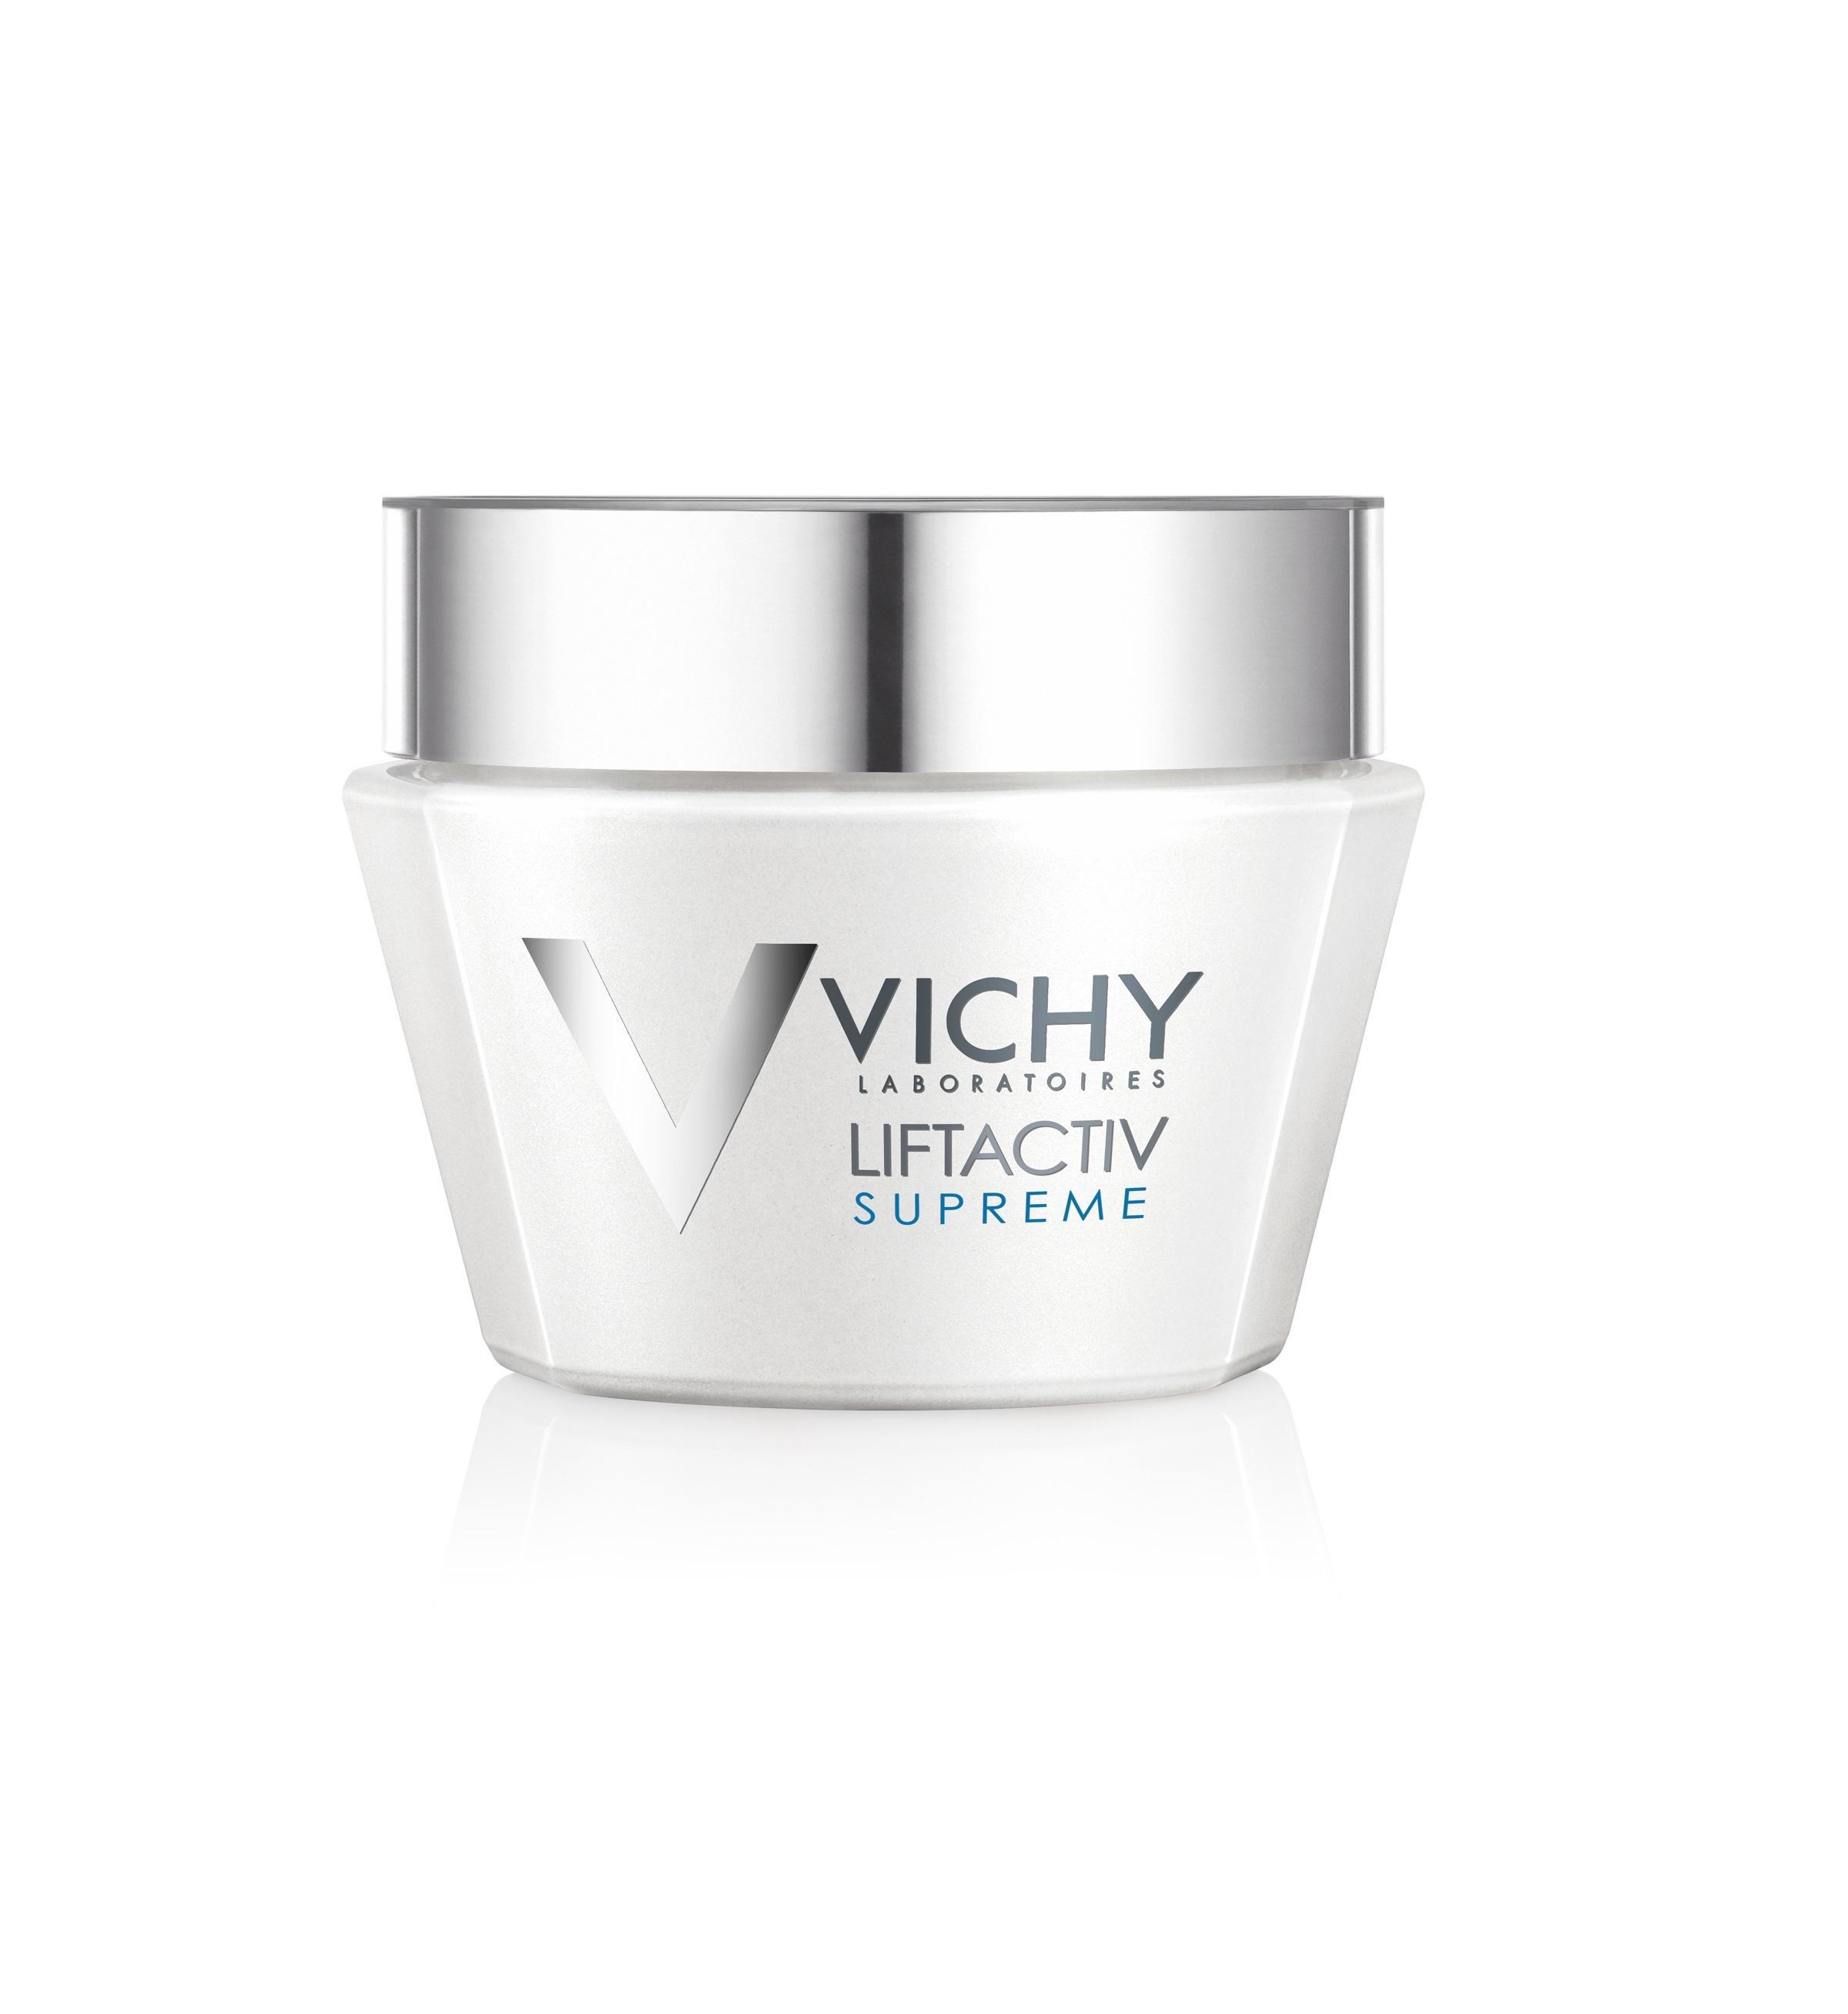 vichy liftactiv supreme day cream reviews in anti age wrinkle cream chickadvisor. Black Bedroom Furniture Sets. Home Design Ideas